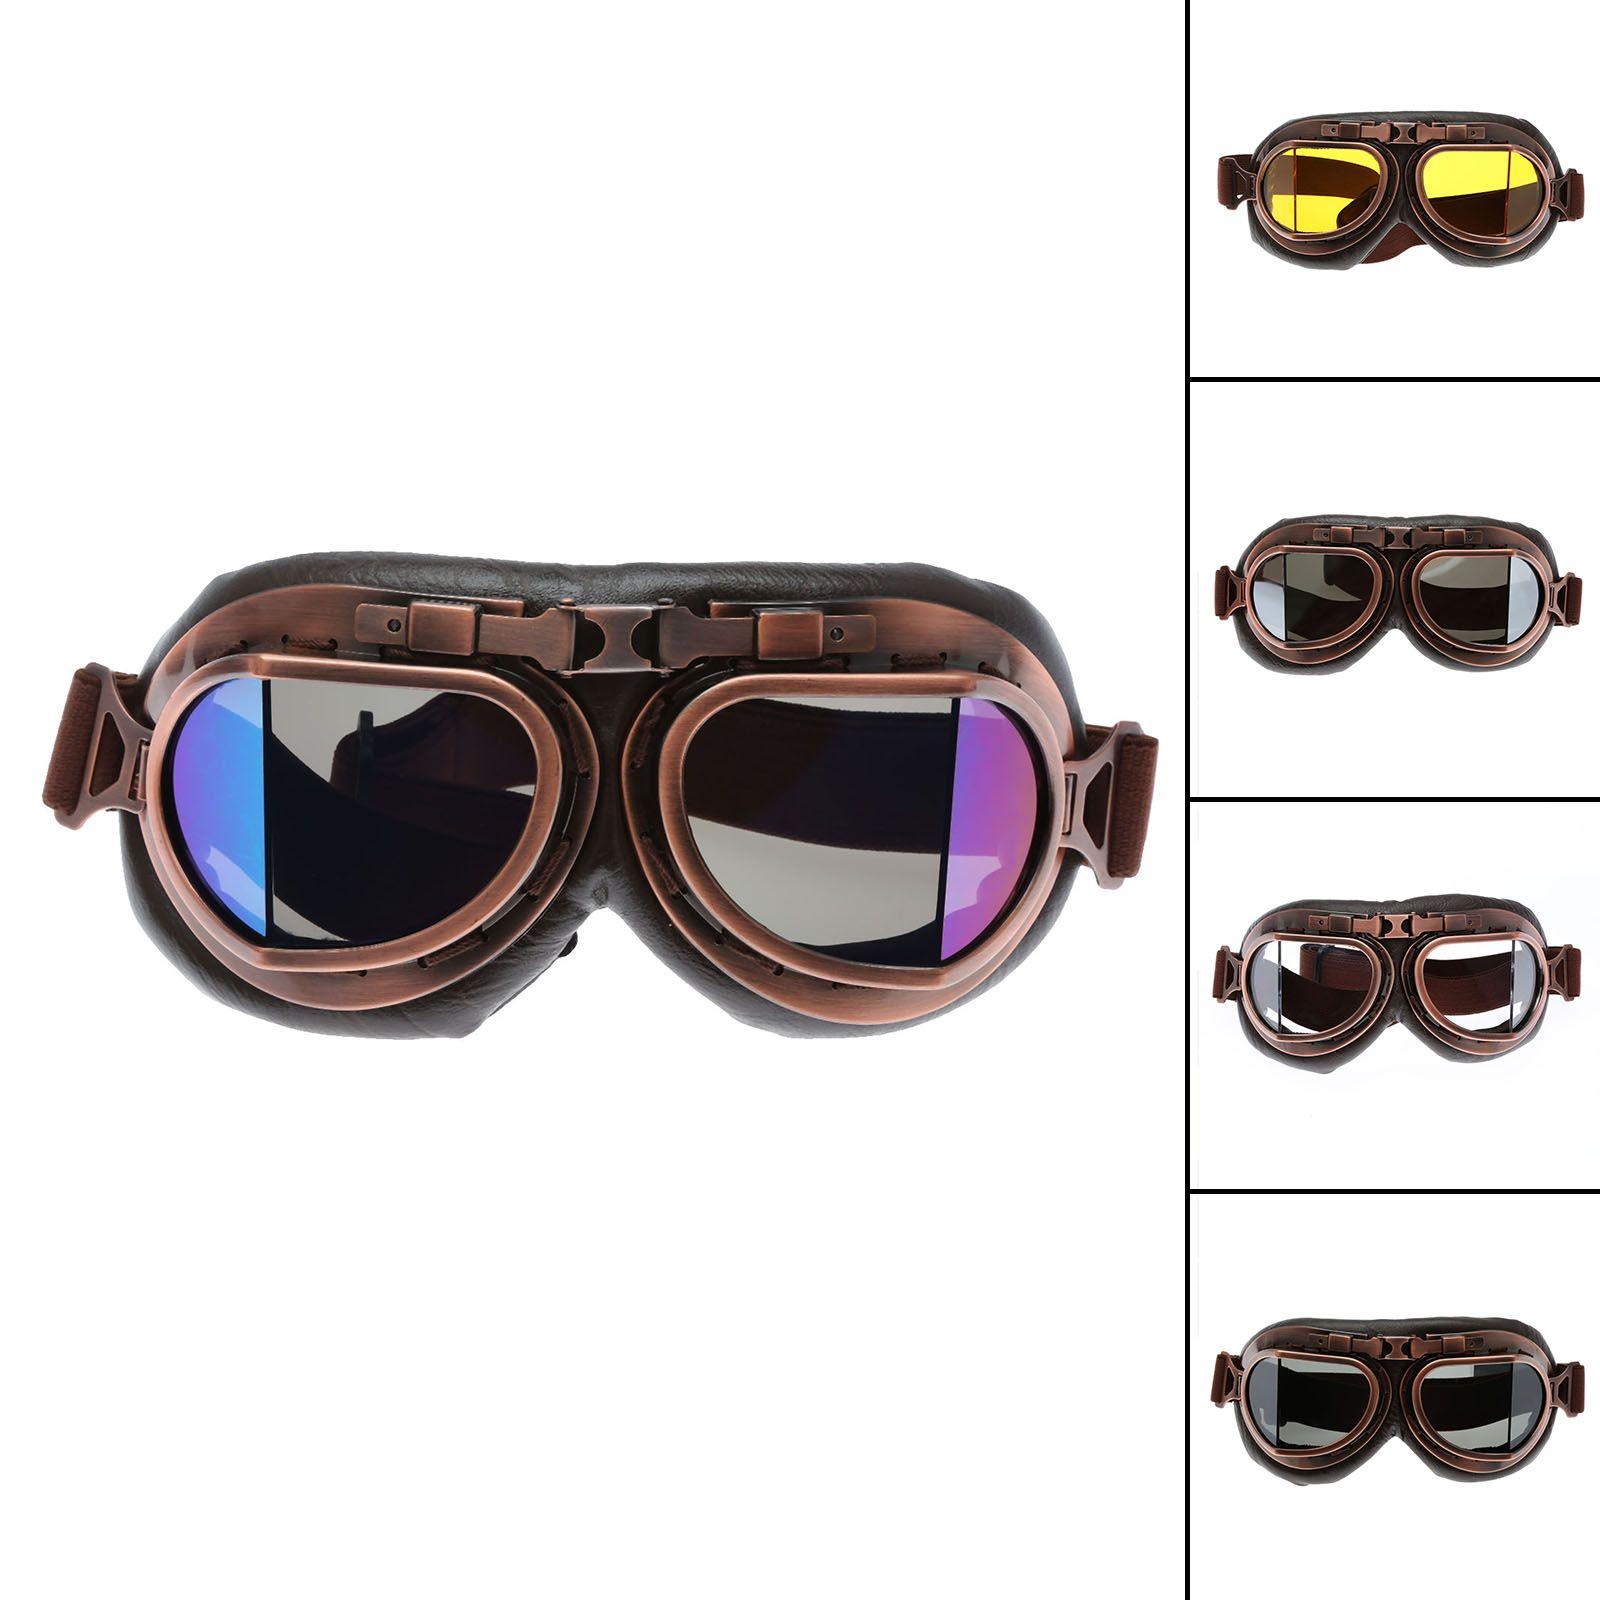 Motorcycle Goggles Glasses Vintage Motocross Classic Goggles Retro Aviator Pilot Cruiser Steampunk ATV <font><b>Bike</b></font> UV Protection Copper